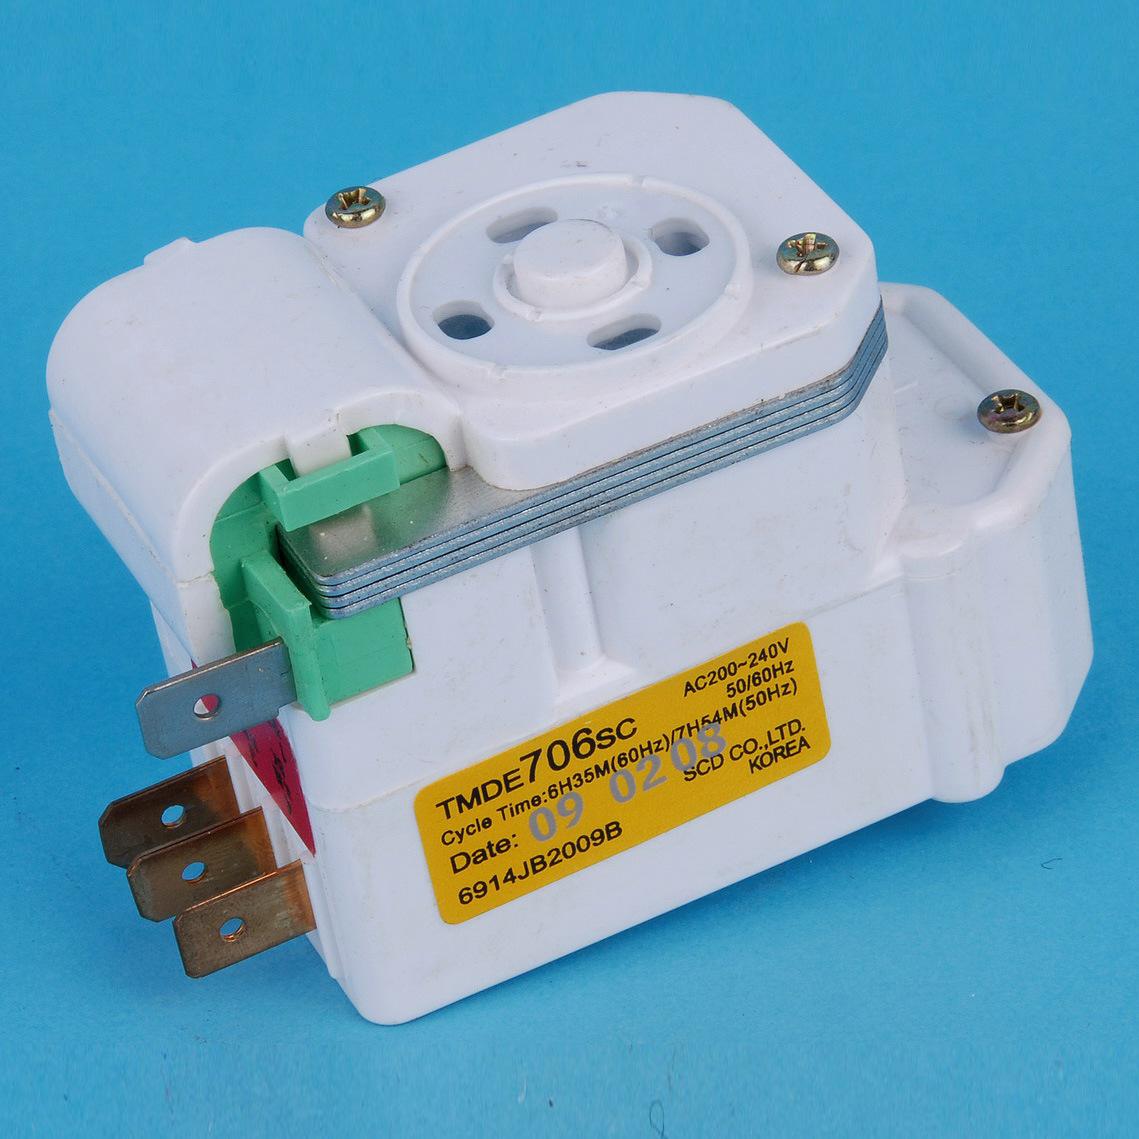 Sanyko Type Plastic Refrigerator Defrost Timer